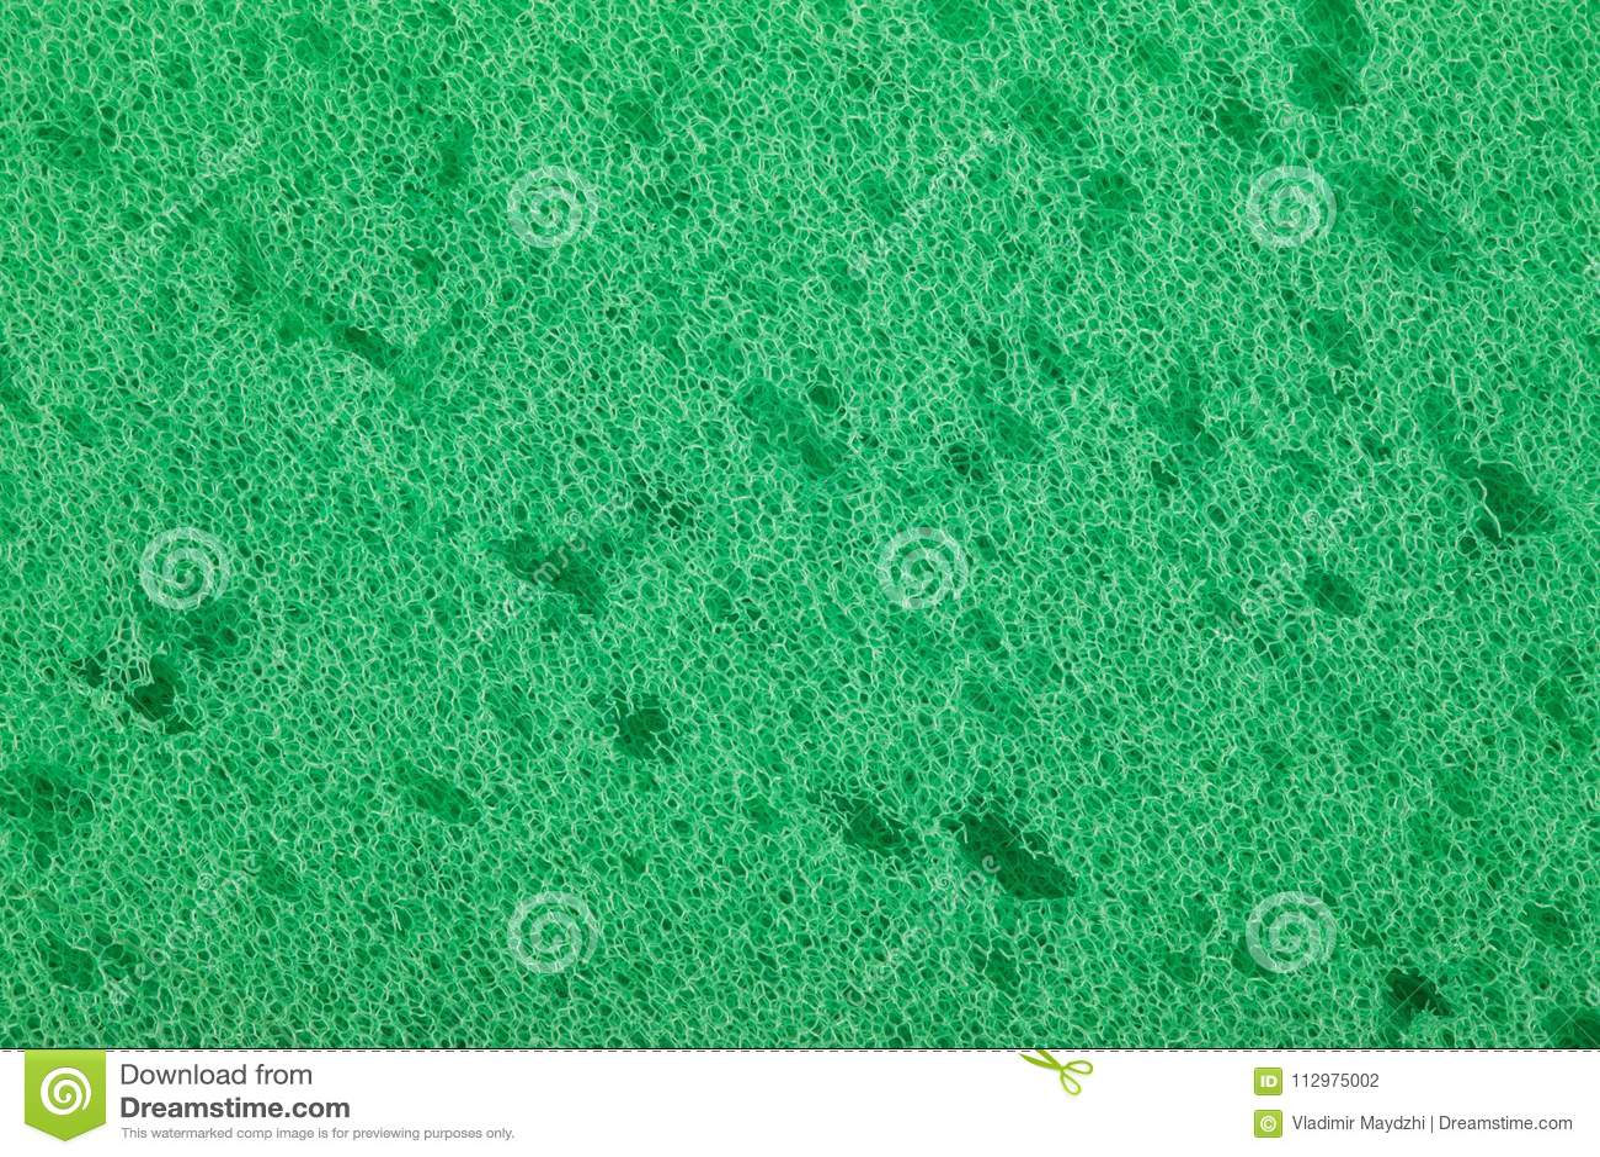 Sponge texture or background